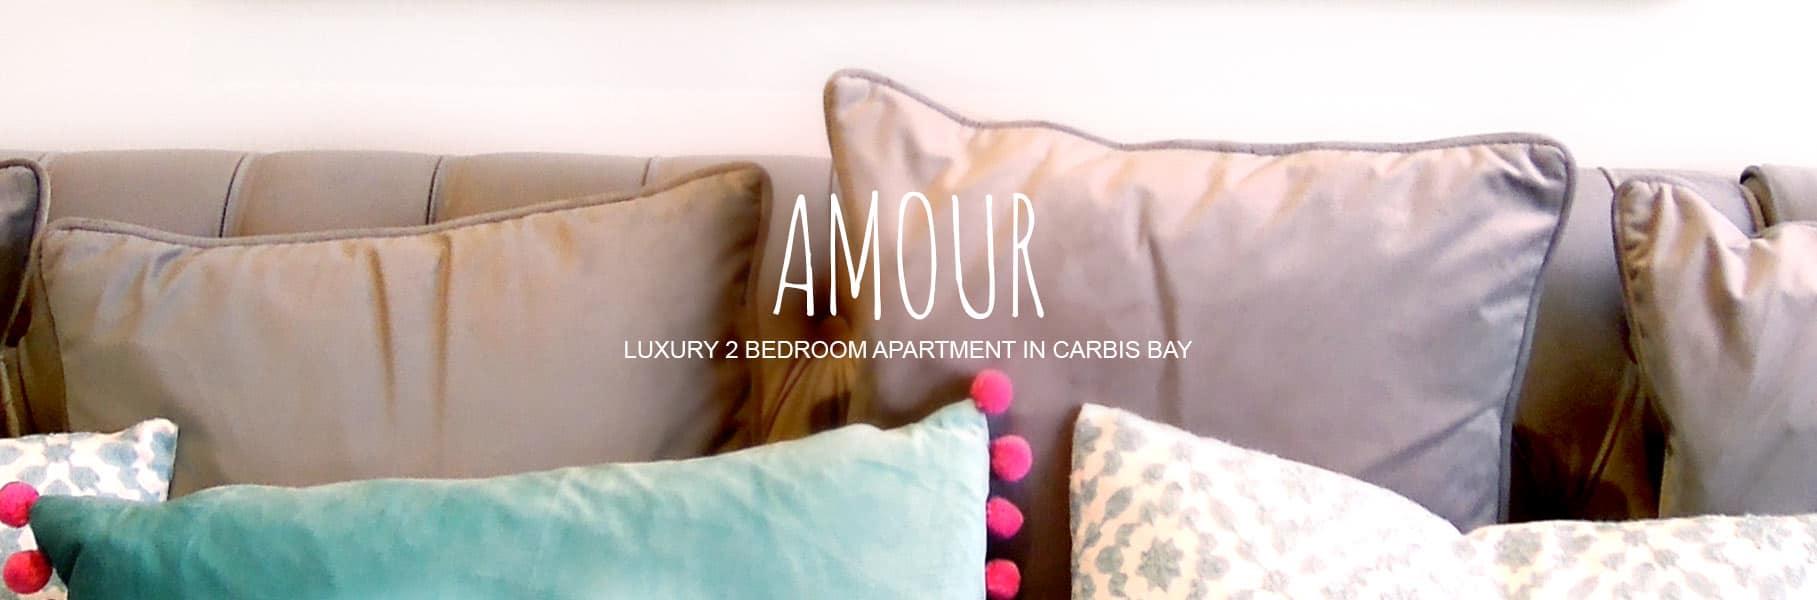 luxury-cornish-holiday-apartment